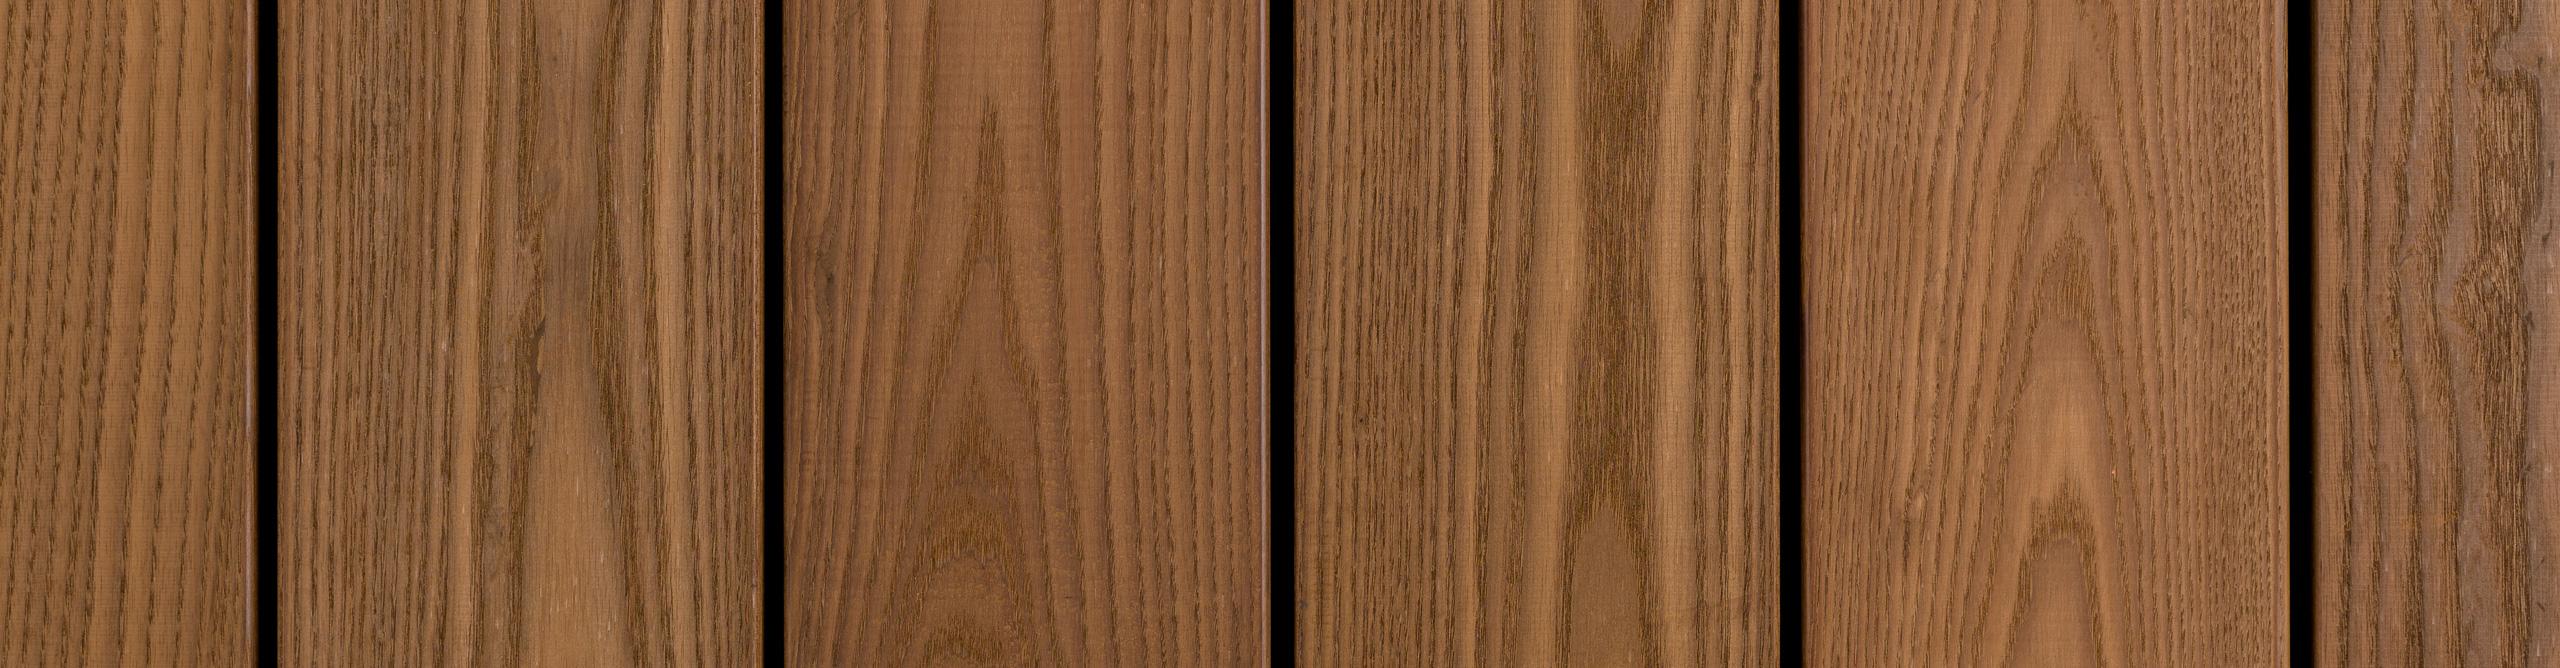 Tero Ask trall i hårdträ, Kärnsund Wood Link